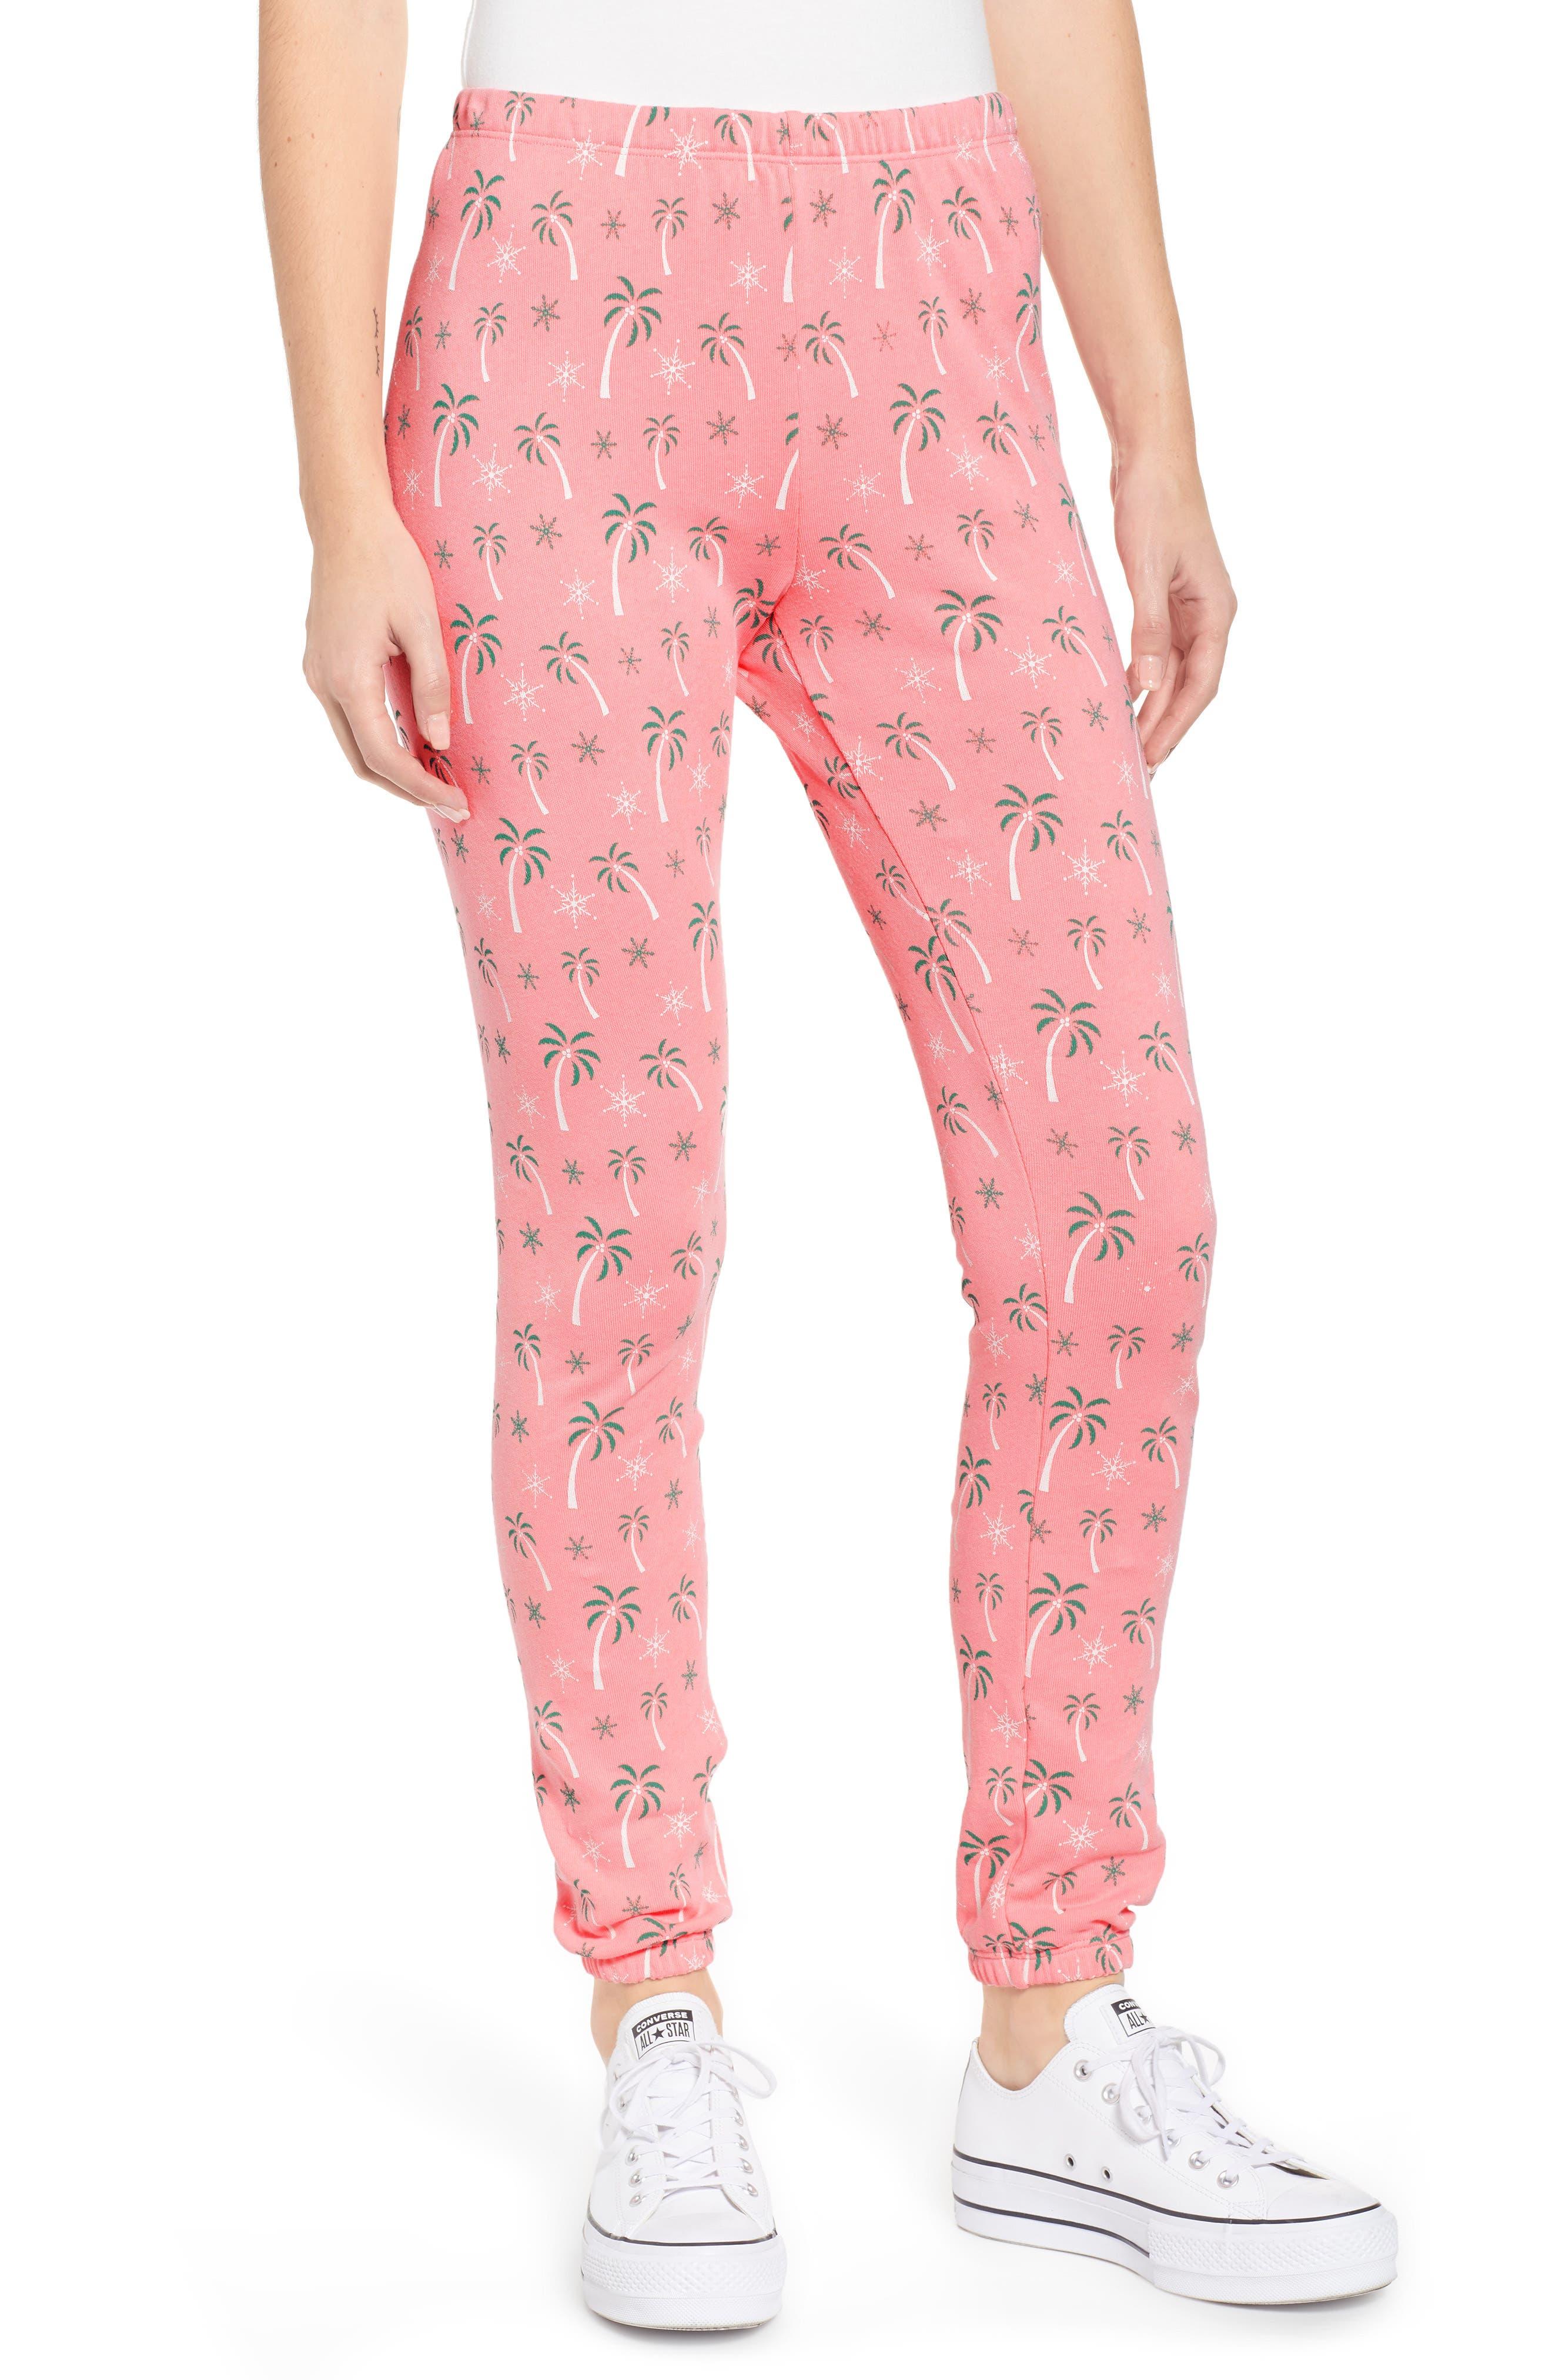 Tropical Christmas Sweatpants,                             Main thumbnail 1, color,                             NEON SIGN